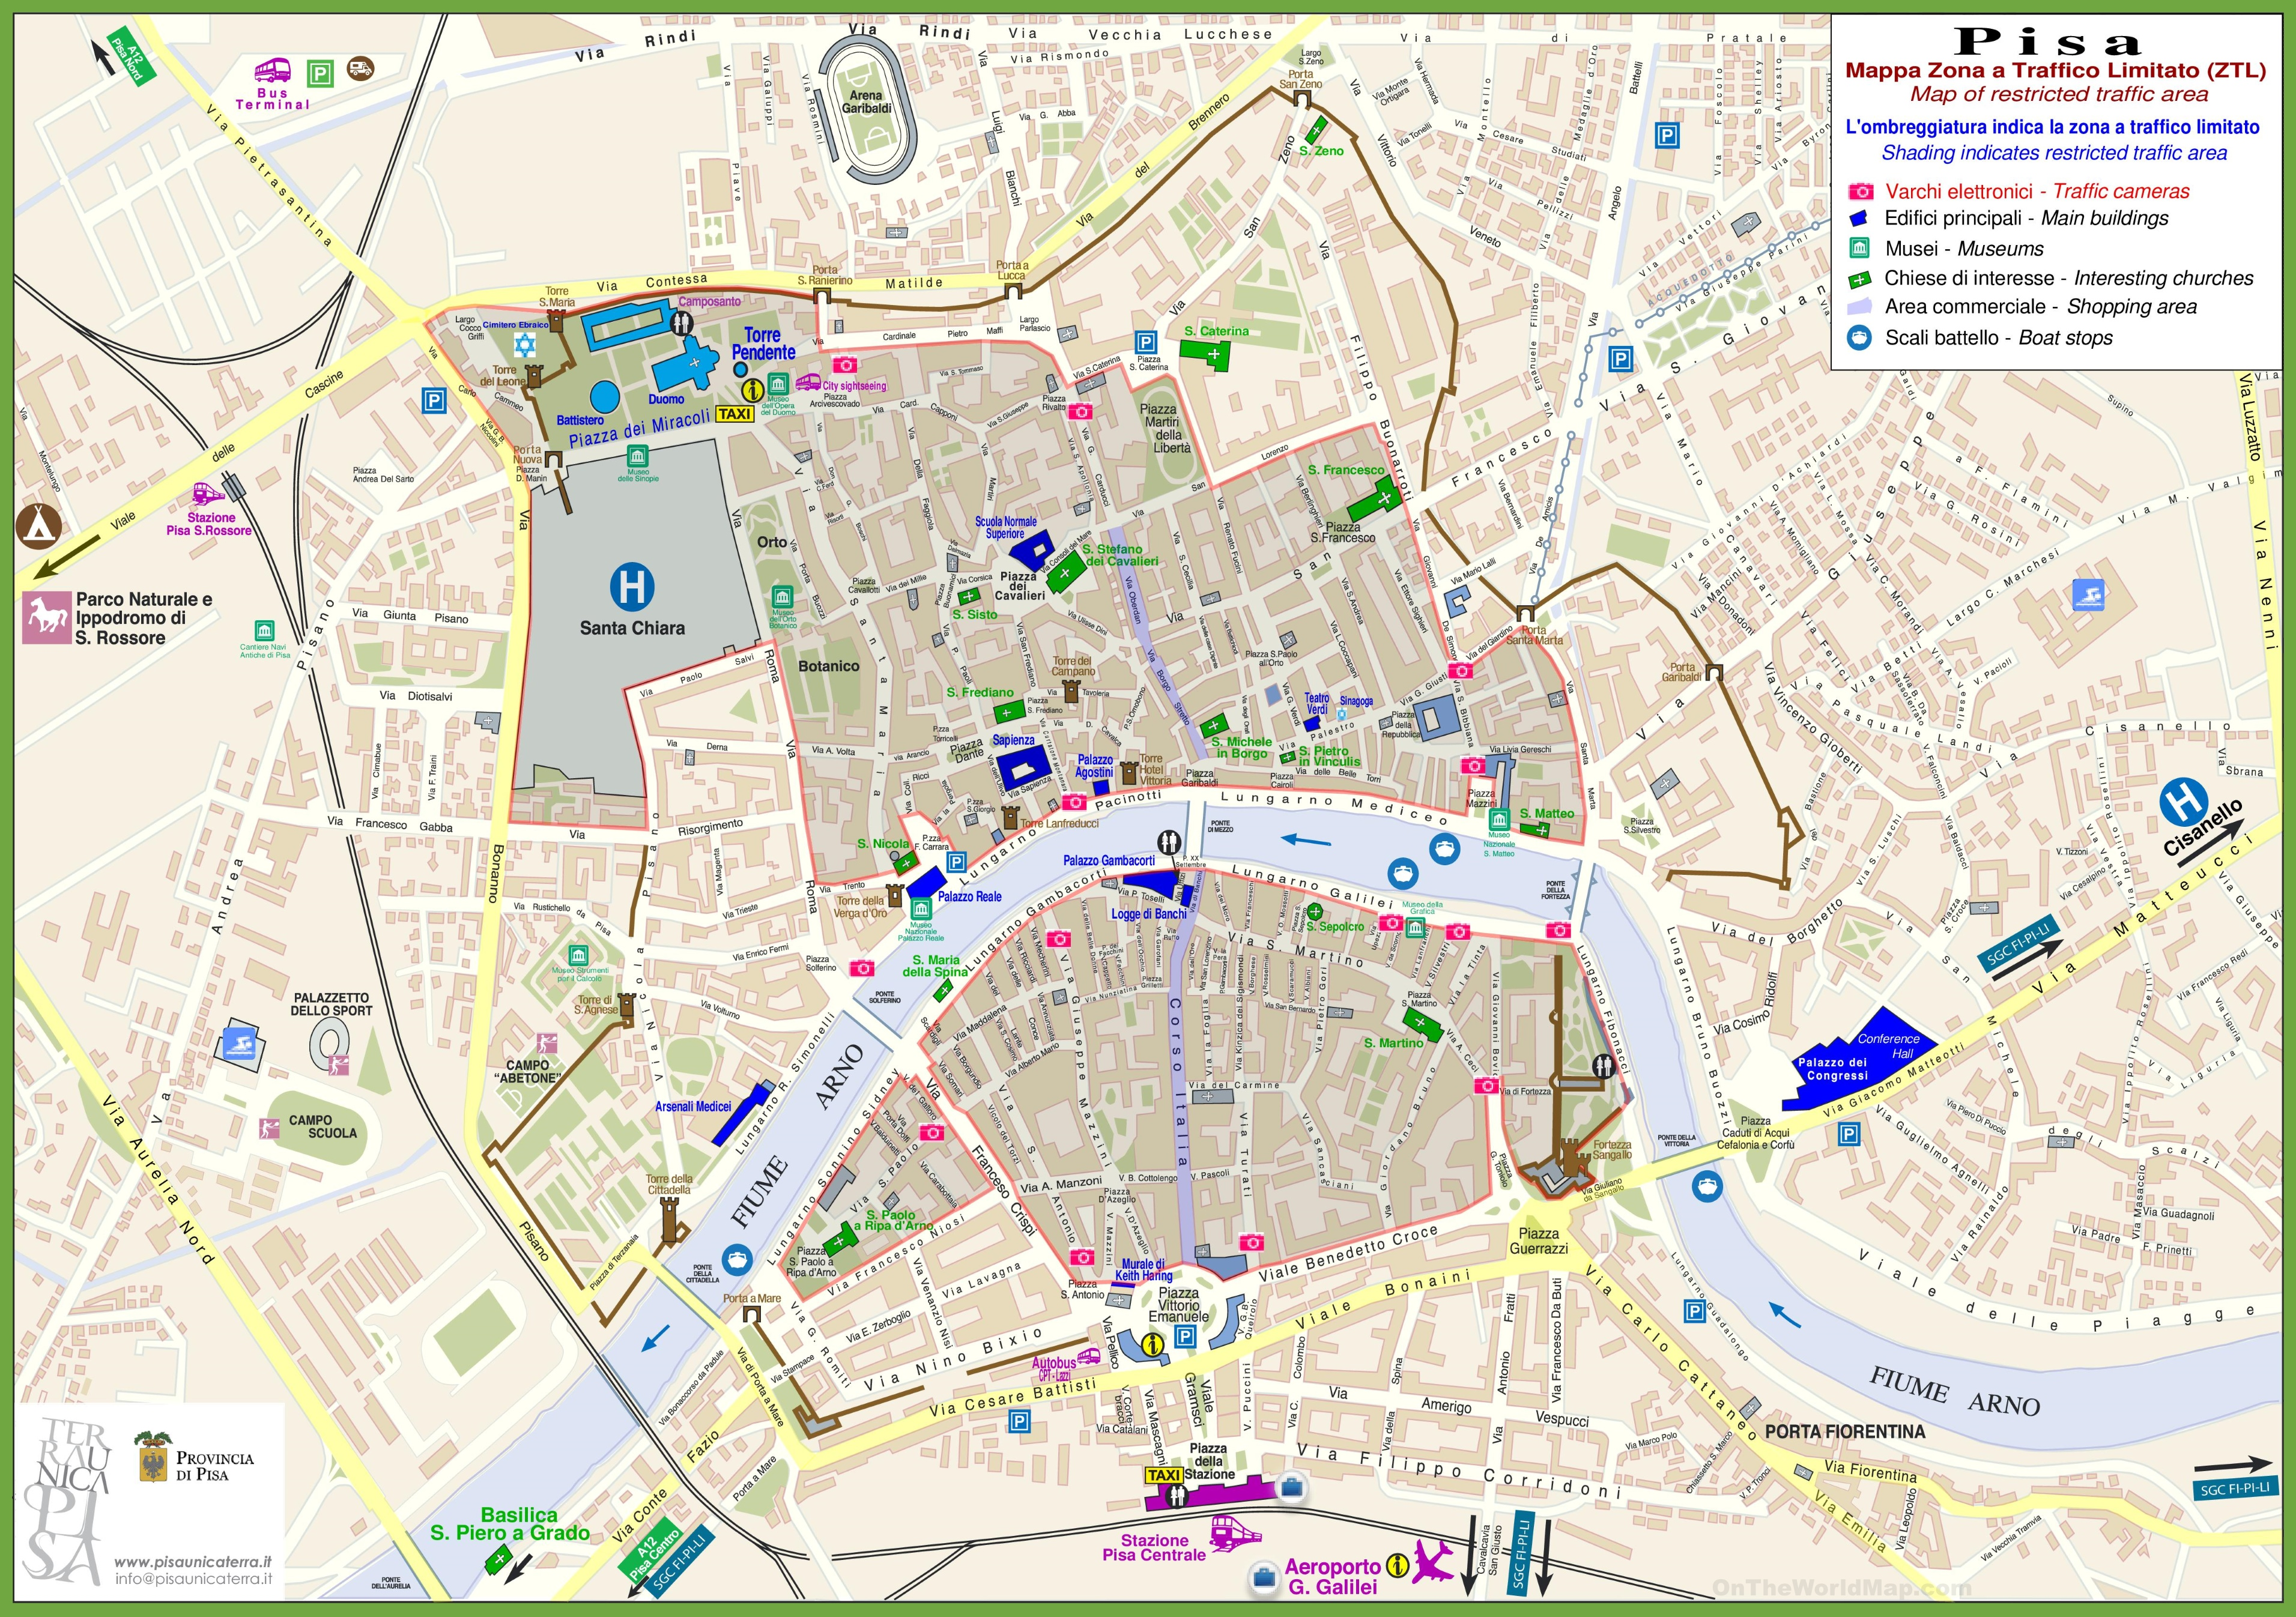 Pisa Sightseeing Map - Los angeles map sightseeing